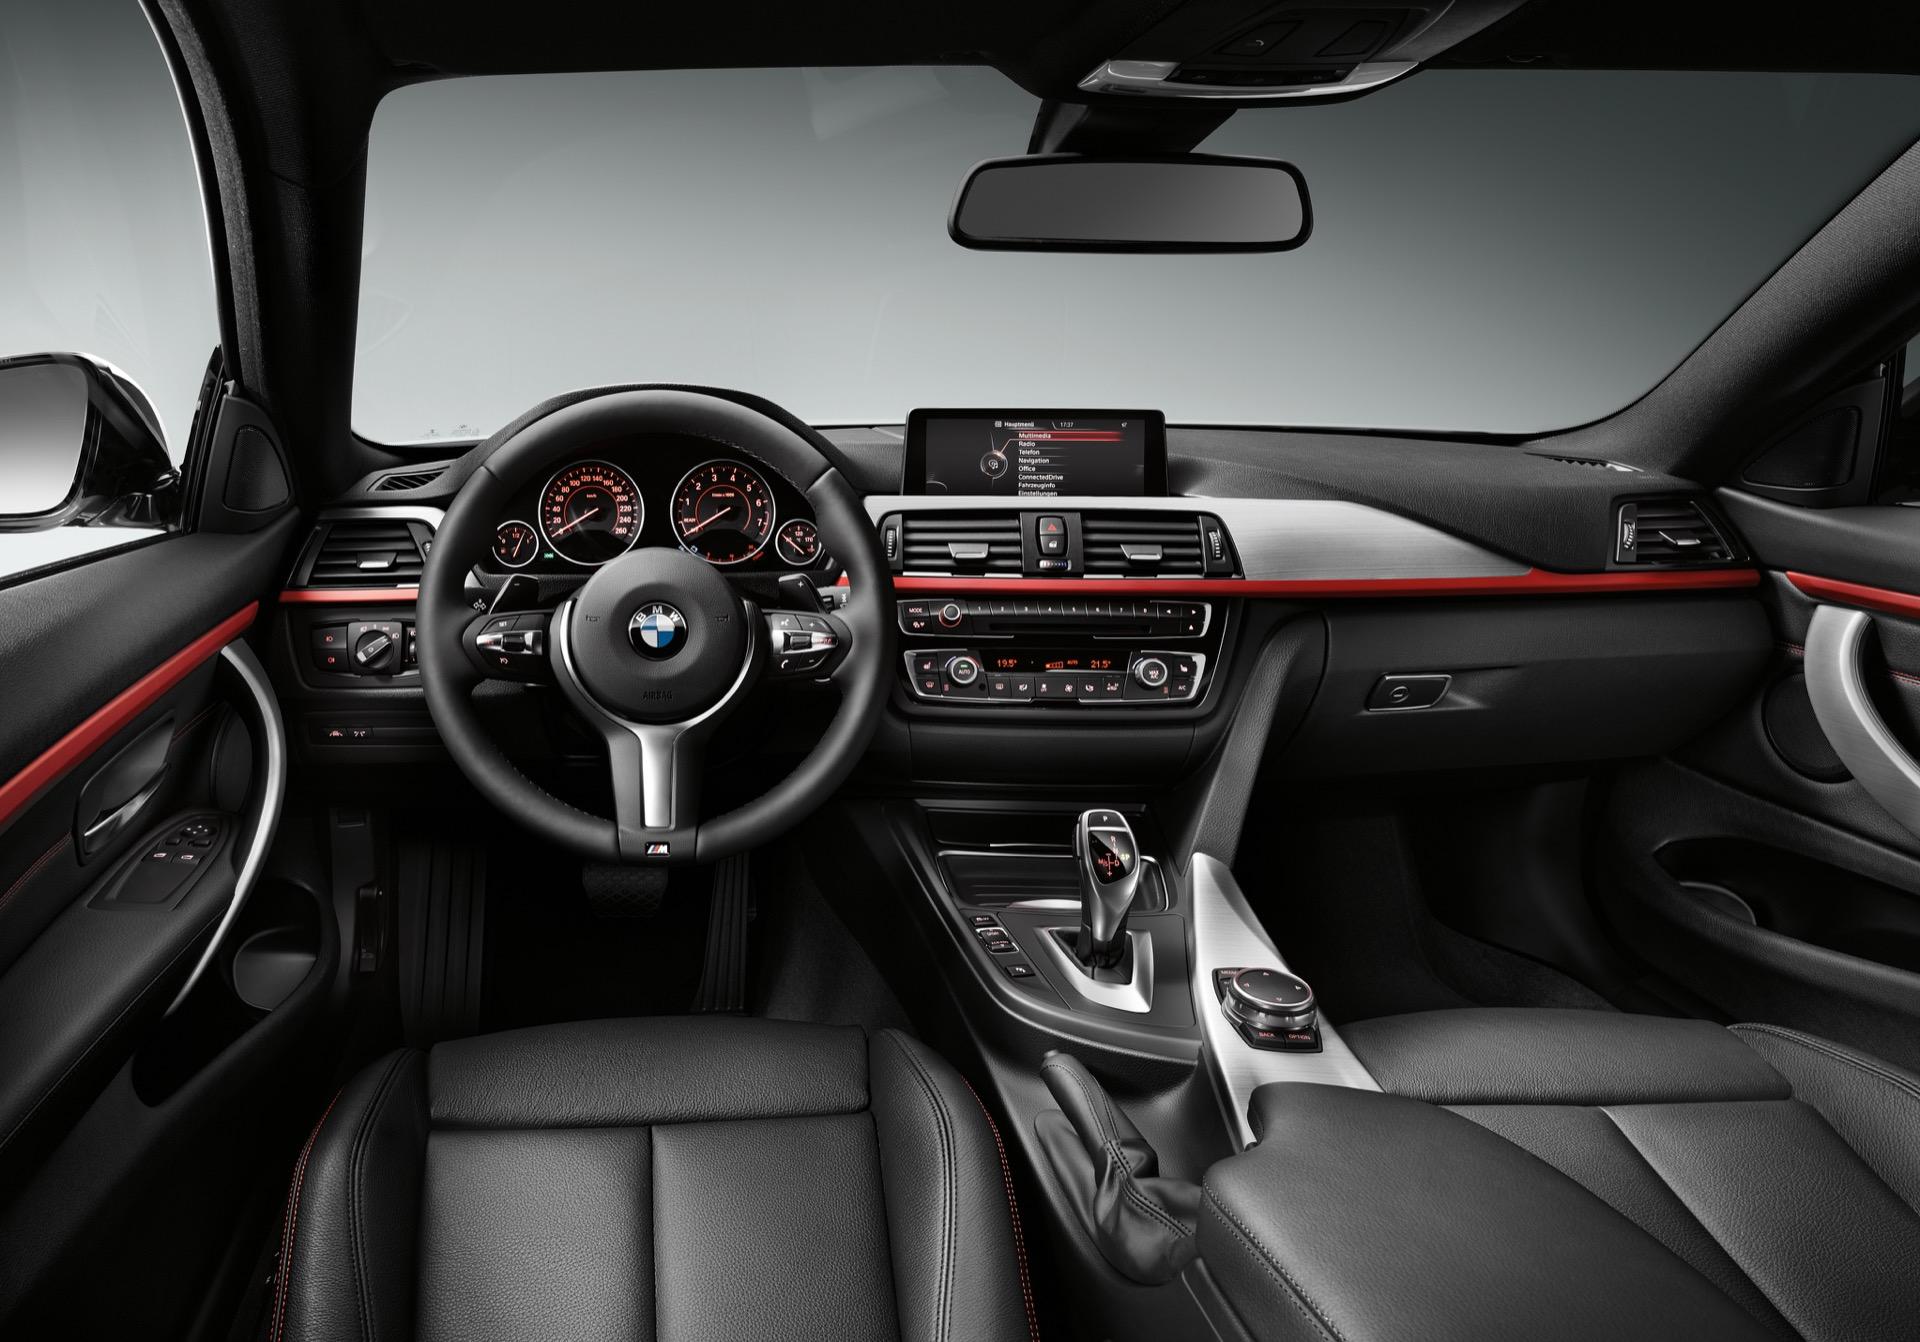 BMW Hyundai Score Big In First Ever JD Power Tech Survey